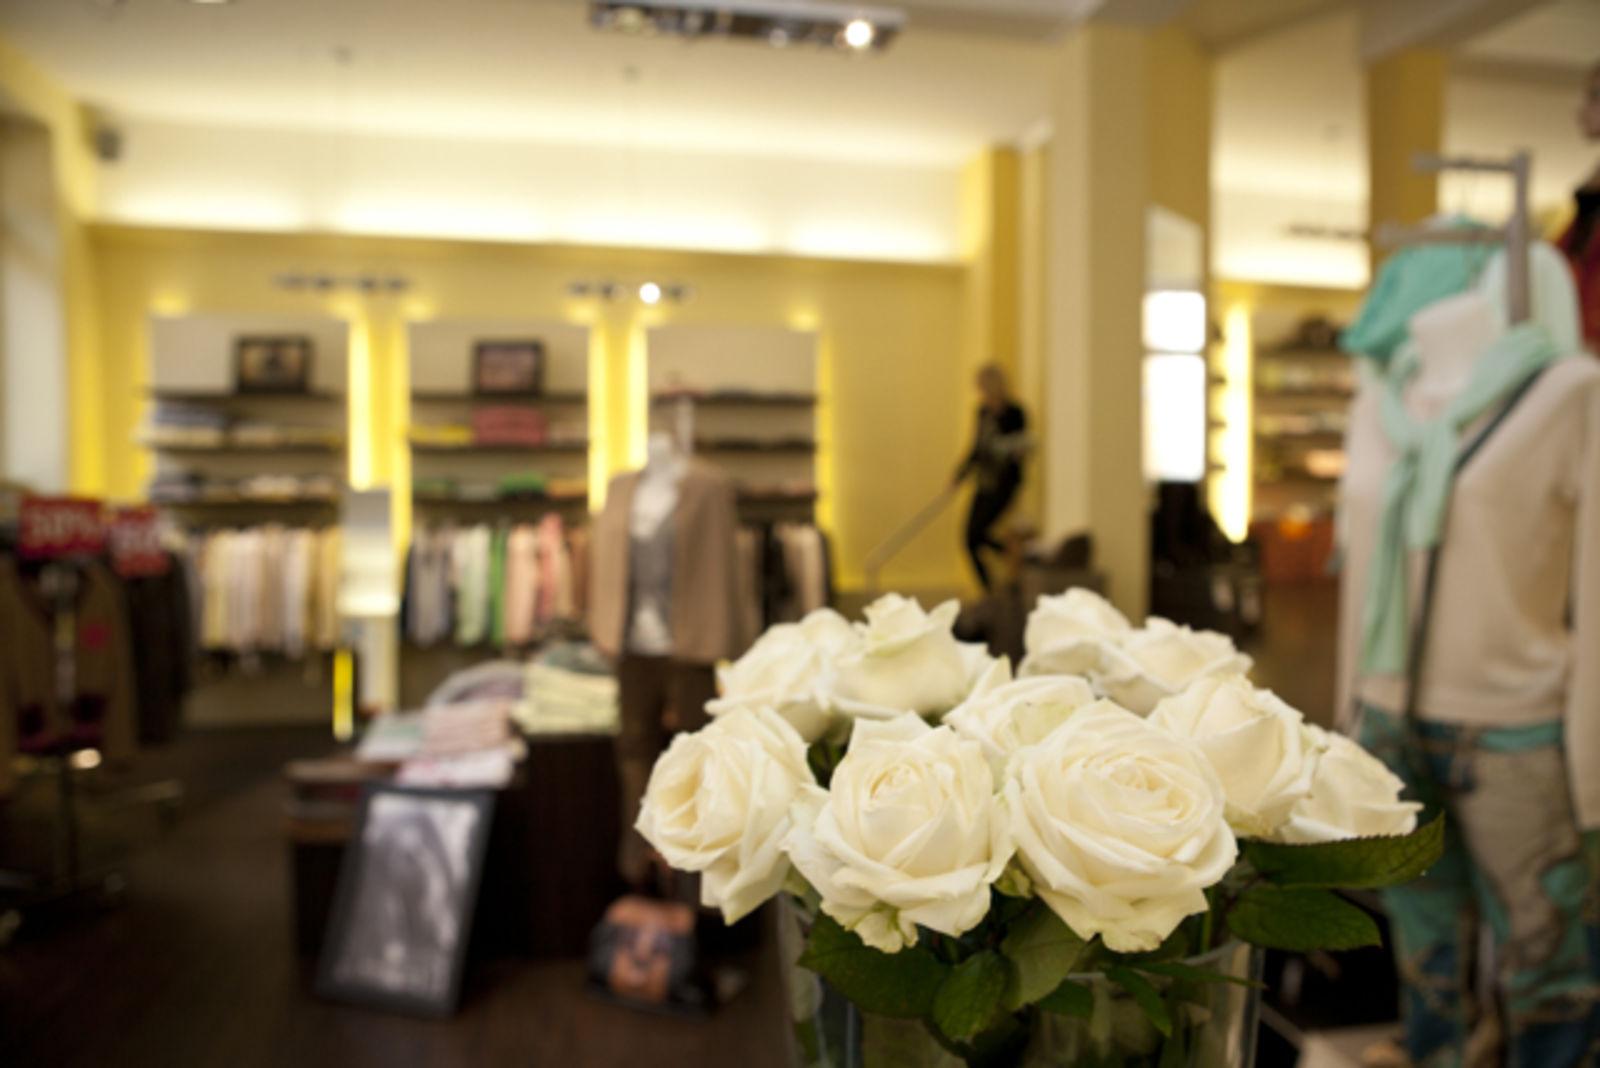 Vera Ensinger Shoes & Fashion in Heidelberg (Bild 5)